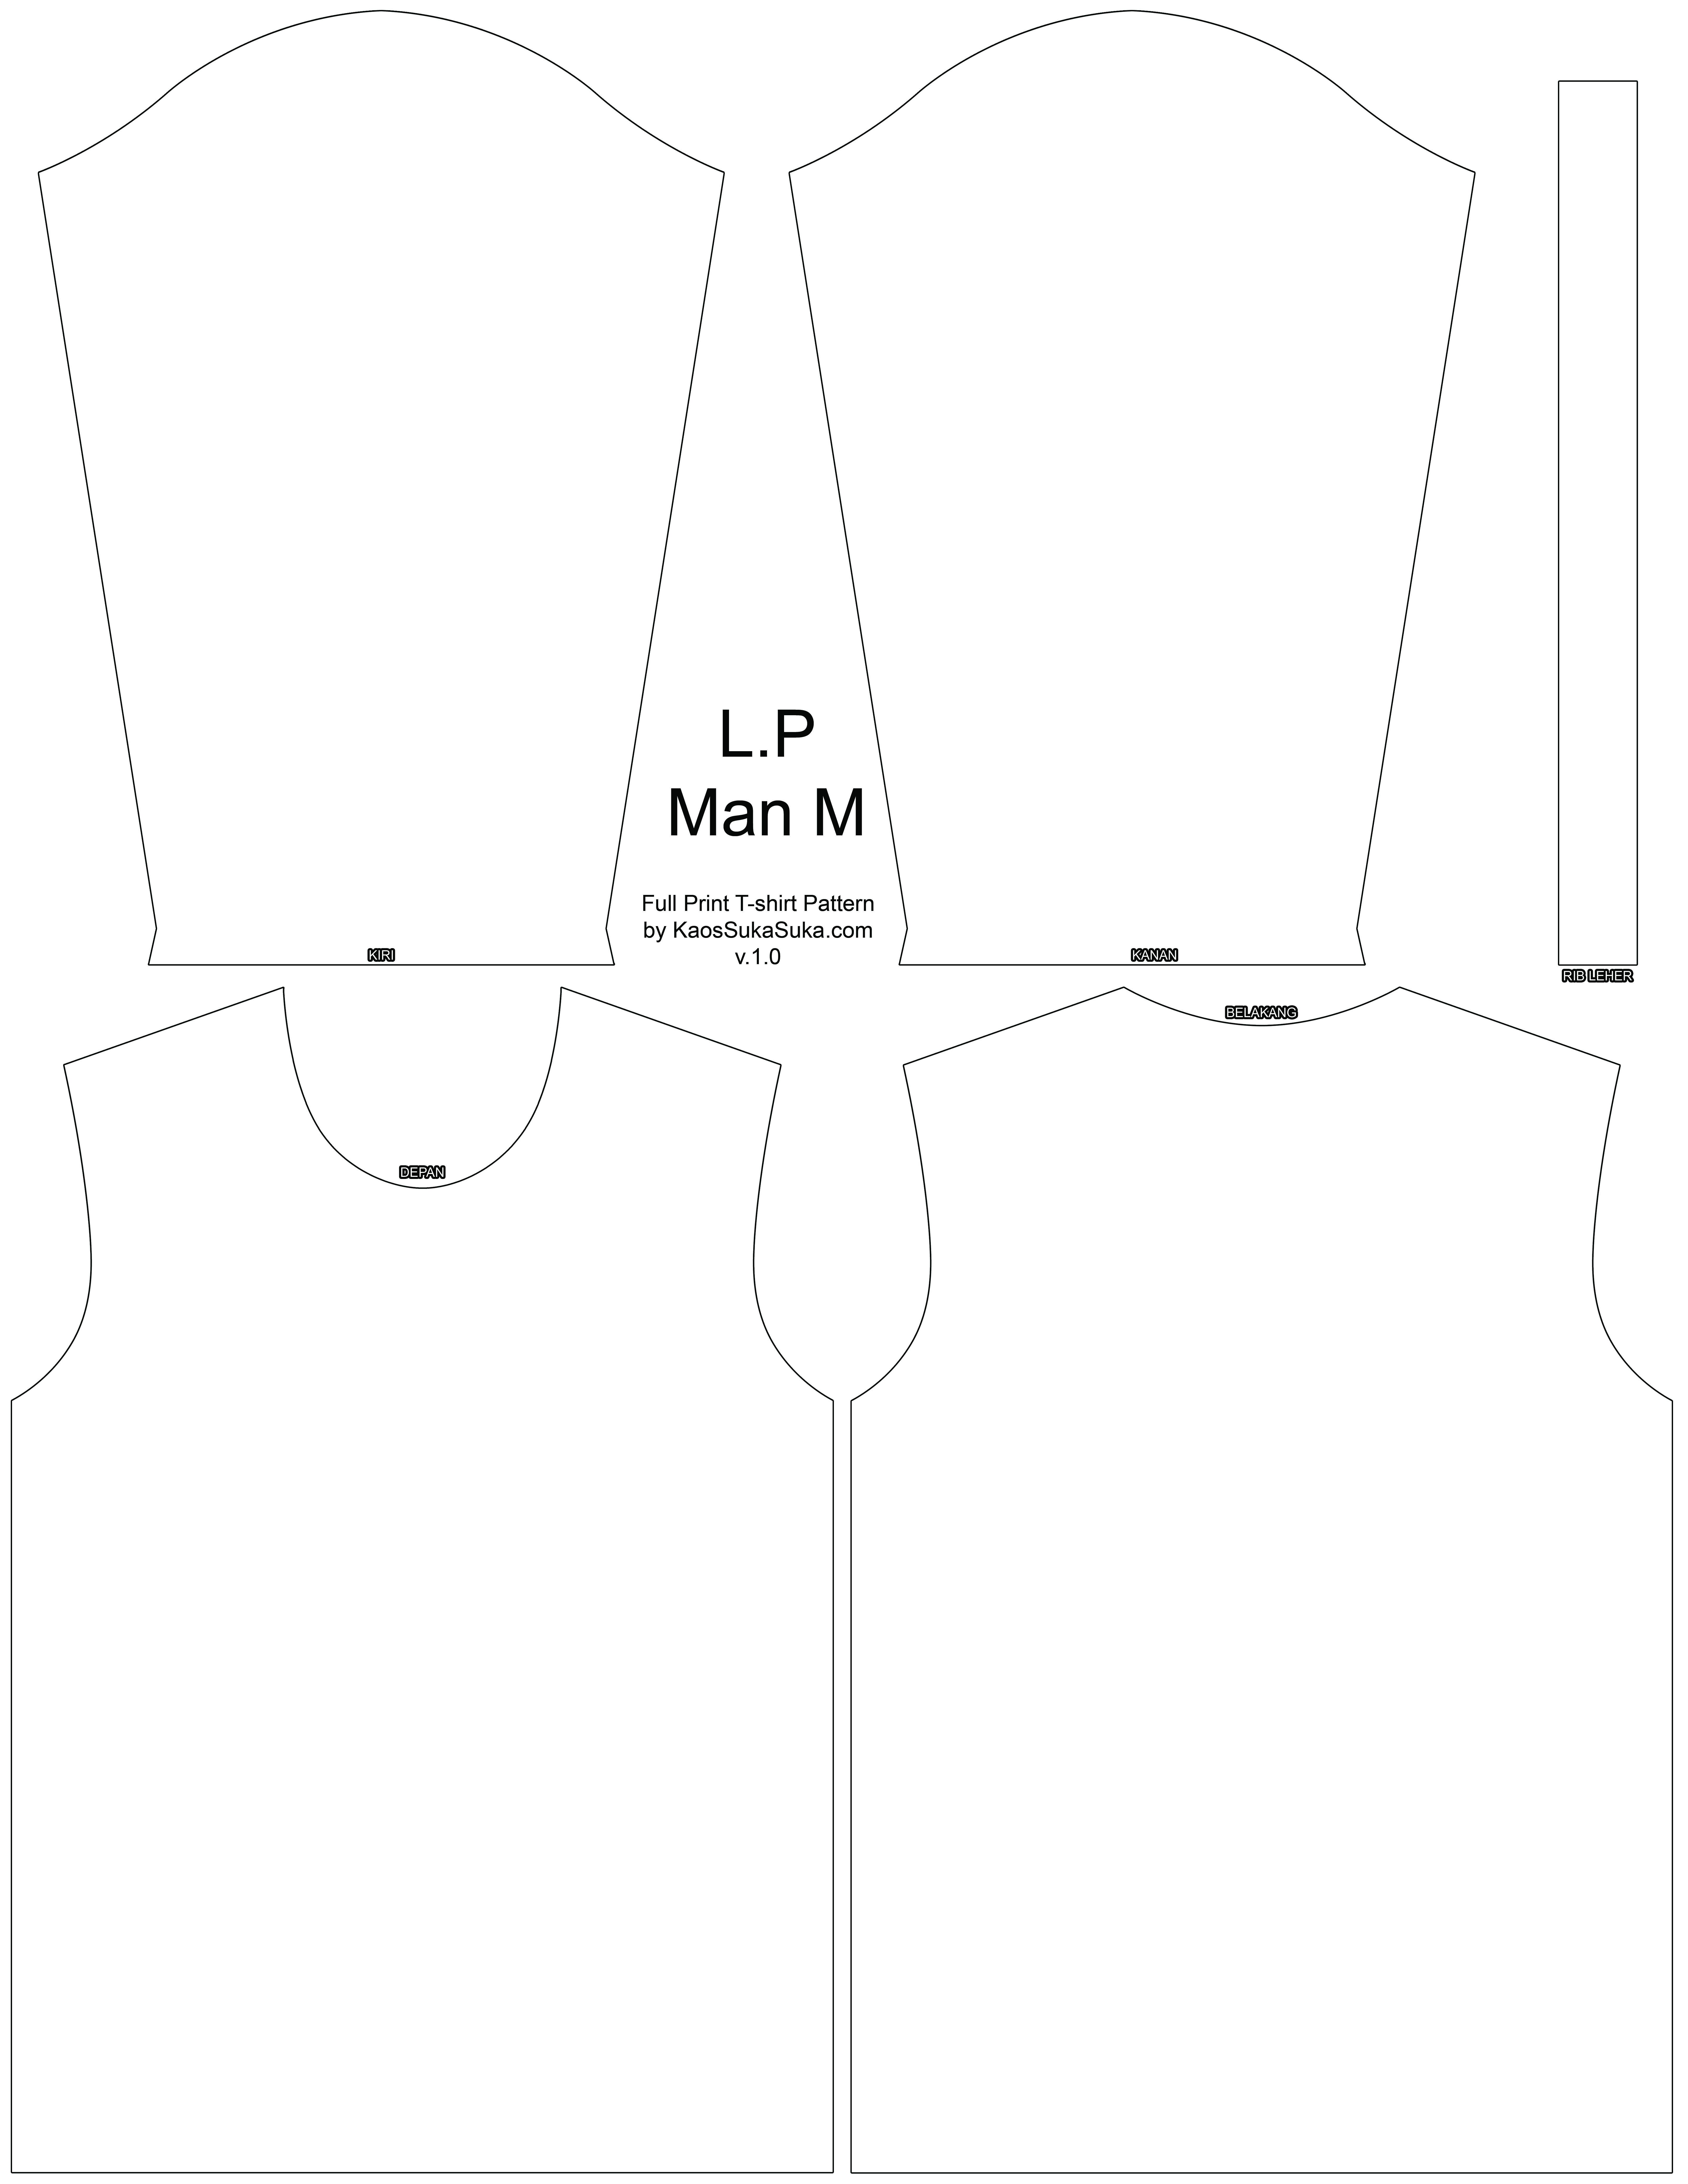 Kaossukasukacom Design Kaos Sendiri Print Kaos Dtg Sablon